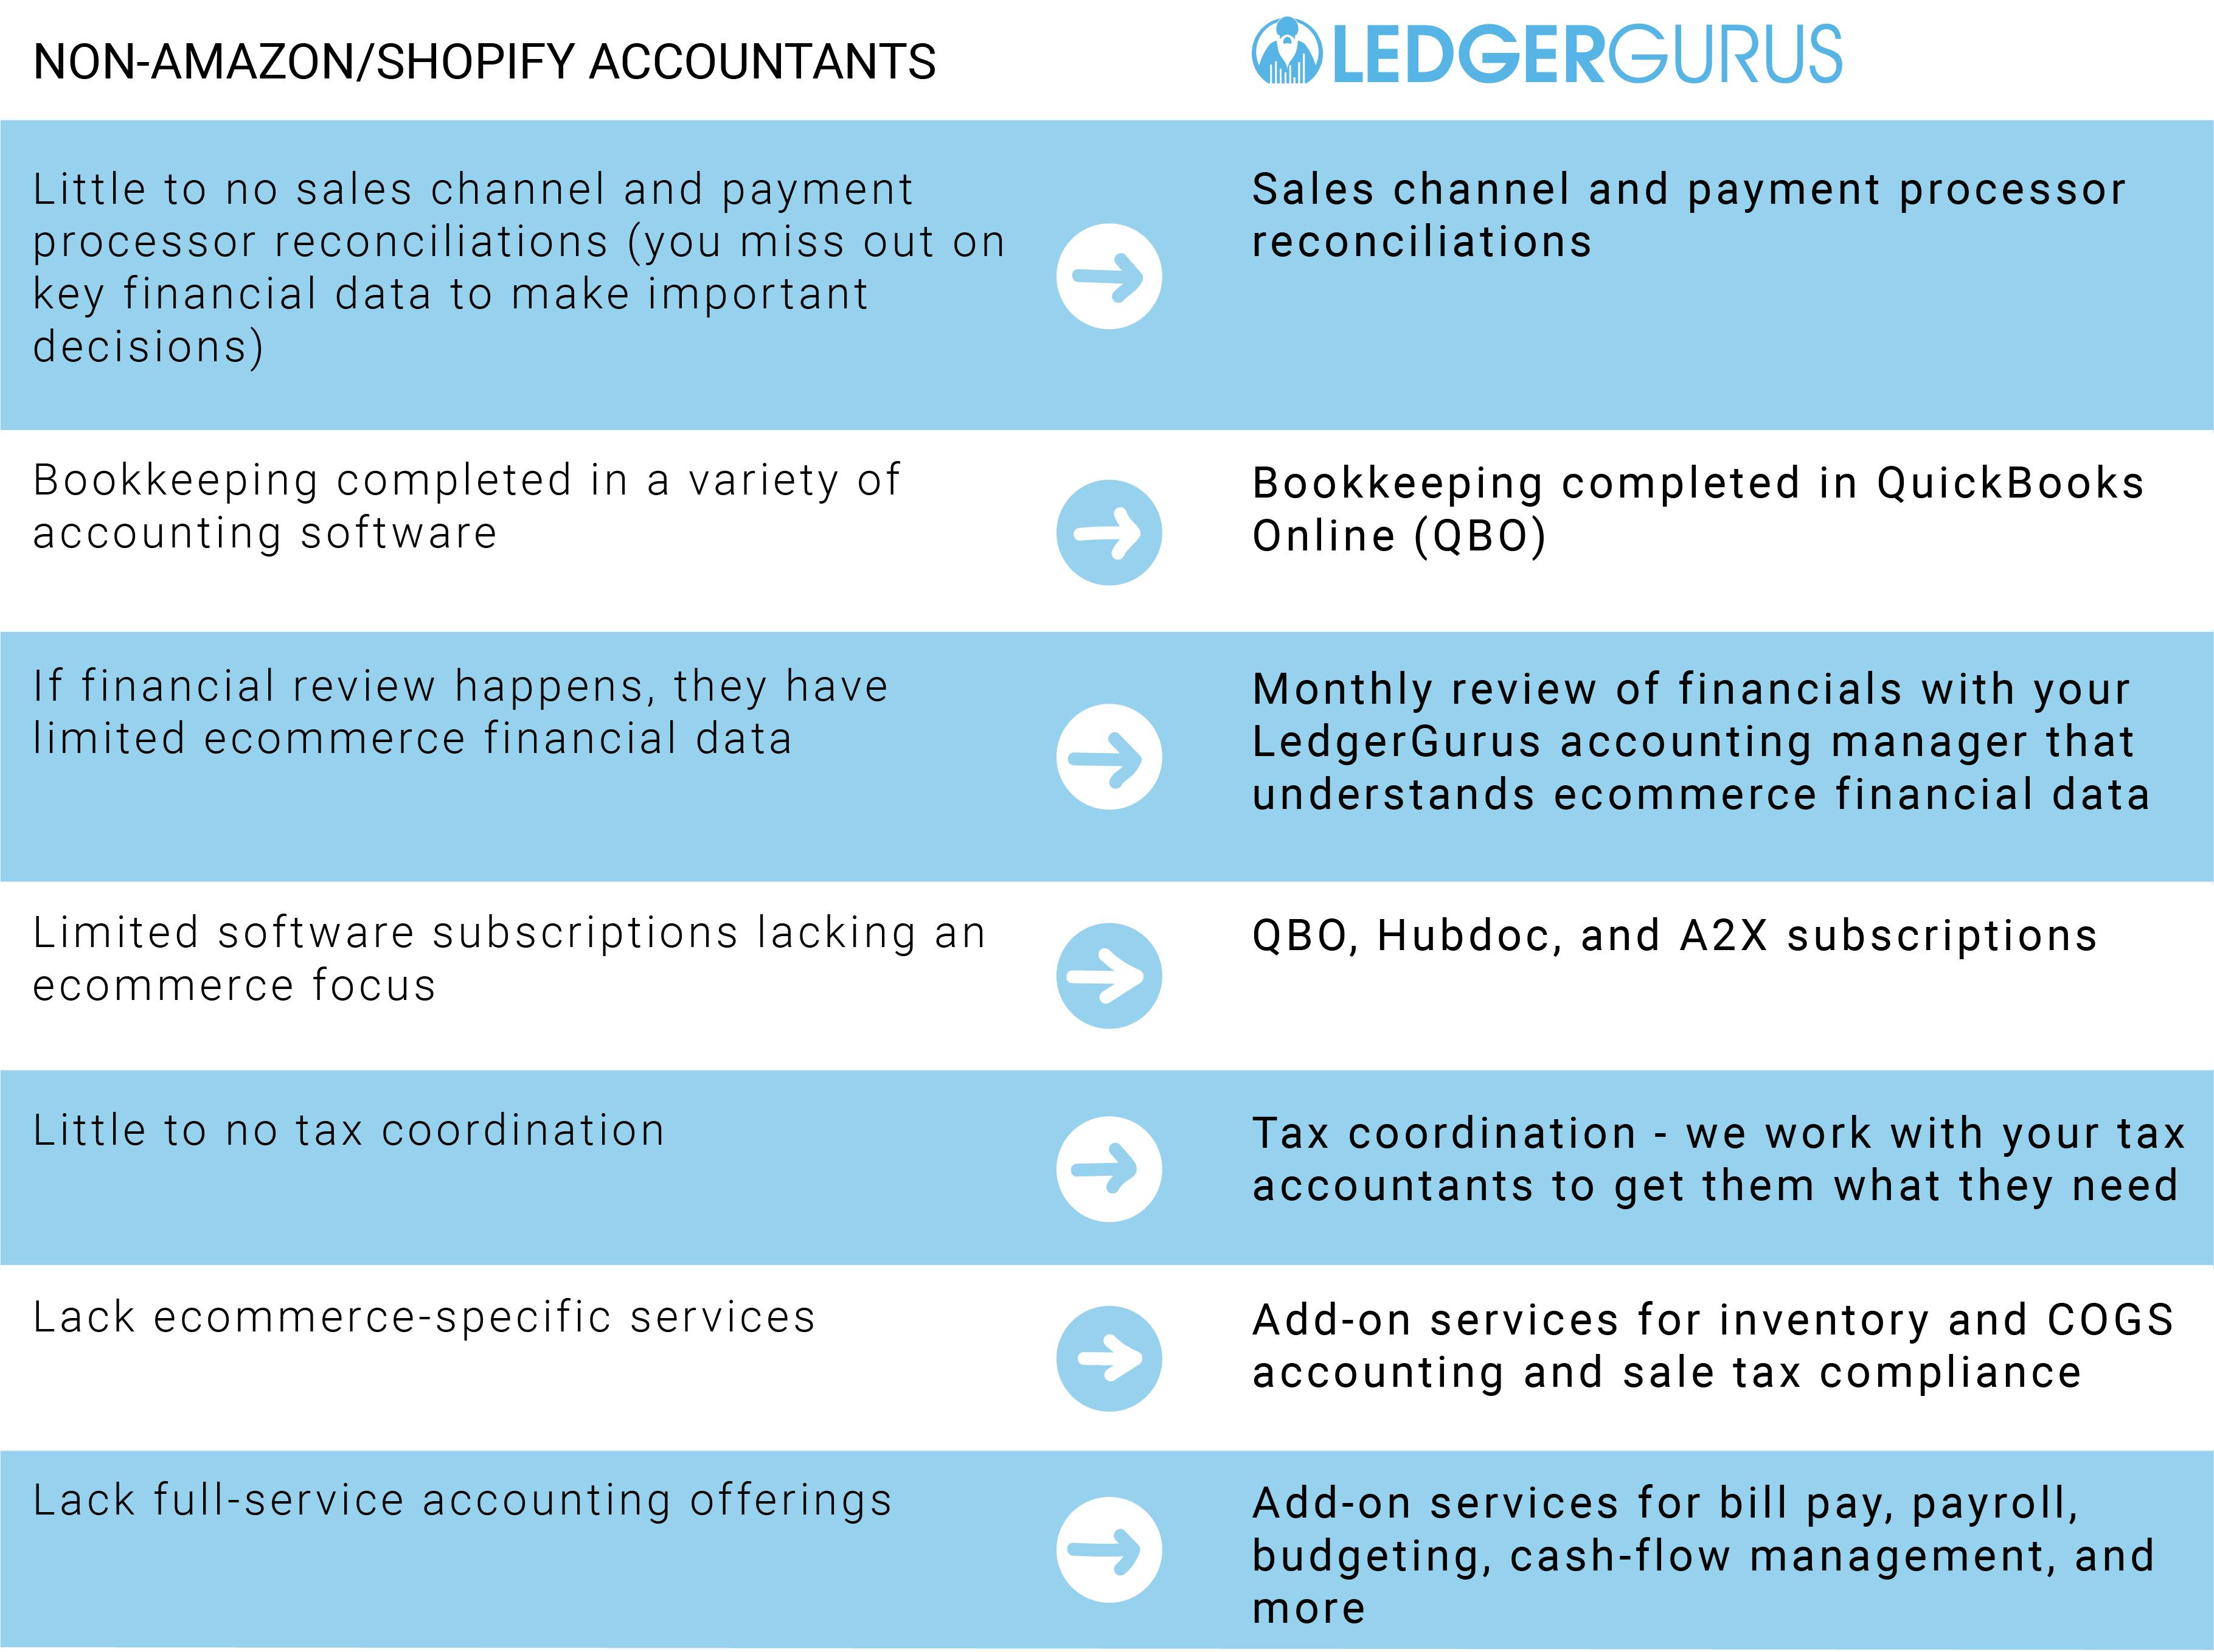 Amazon/Shopify Accounting services - Non-Amazon/Shopify Accountants vs LedgerGurus